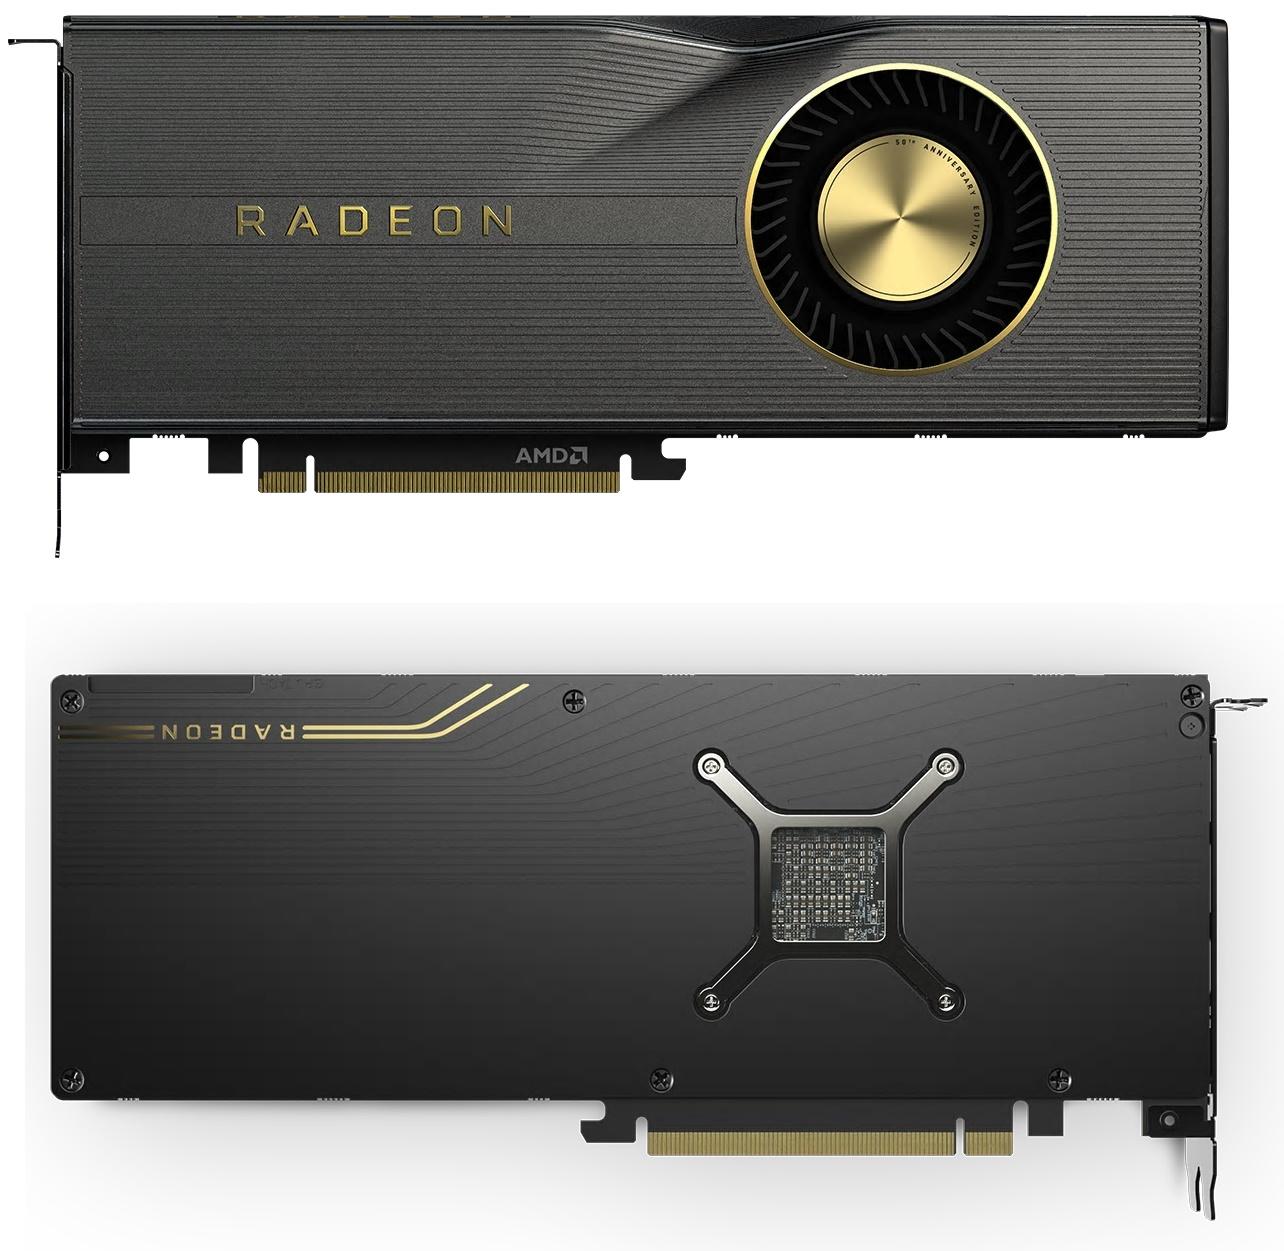 NBB-Wochenangebote: z.B. AMD Radeon RX 5700 XT 50th Anniversary (1830-1980MHz Boost, 8GB GDDR6, 225W TDP, 8-Pin & 6-Pin PCIe, Dual-Slot)